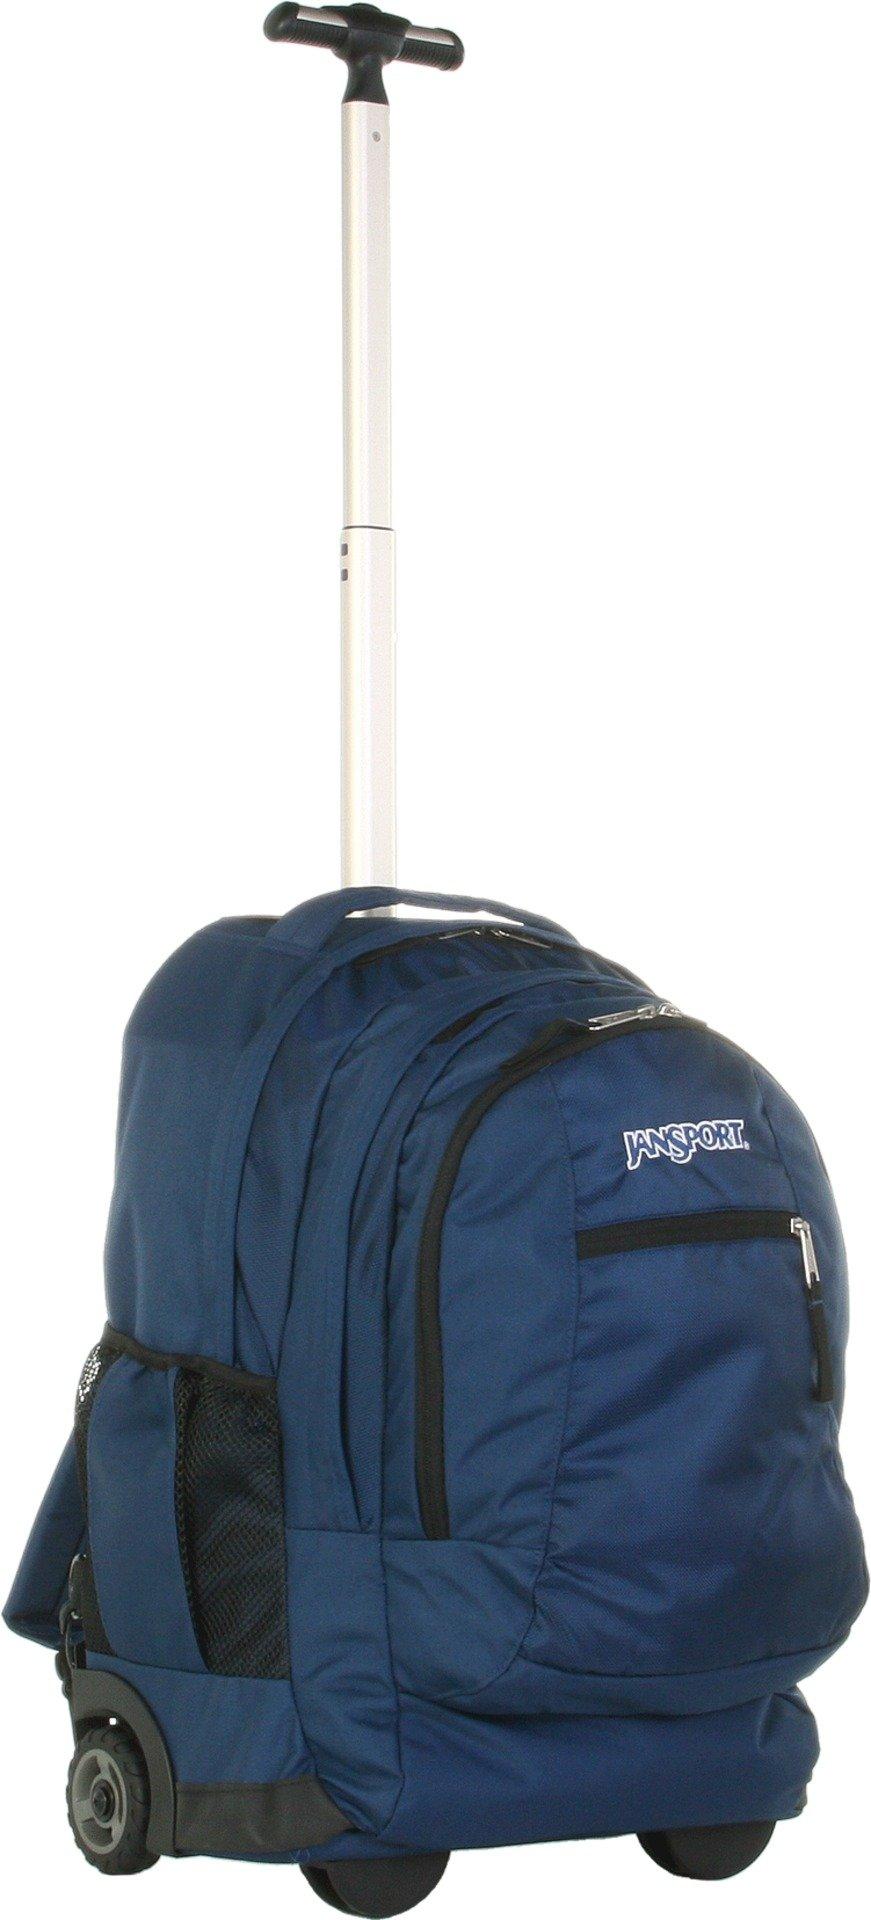 Jansport Driver 8 Wheeled Backpack (Navy) by JanSport